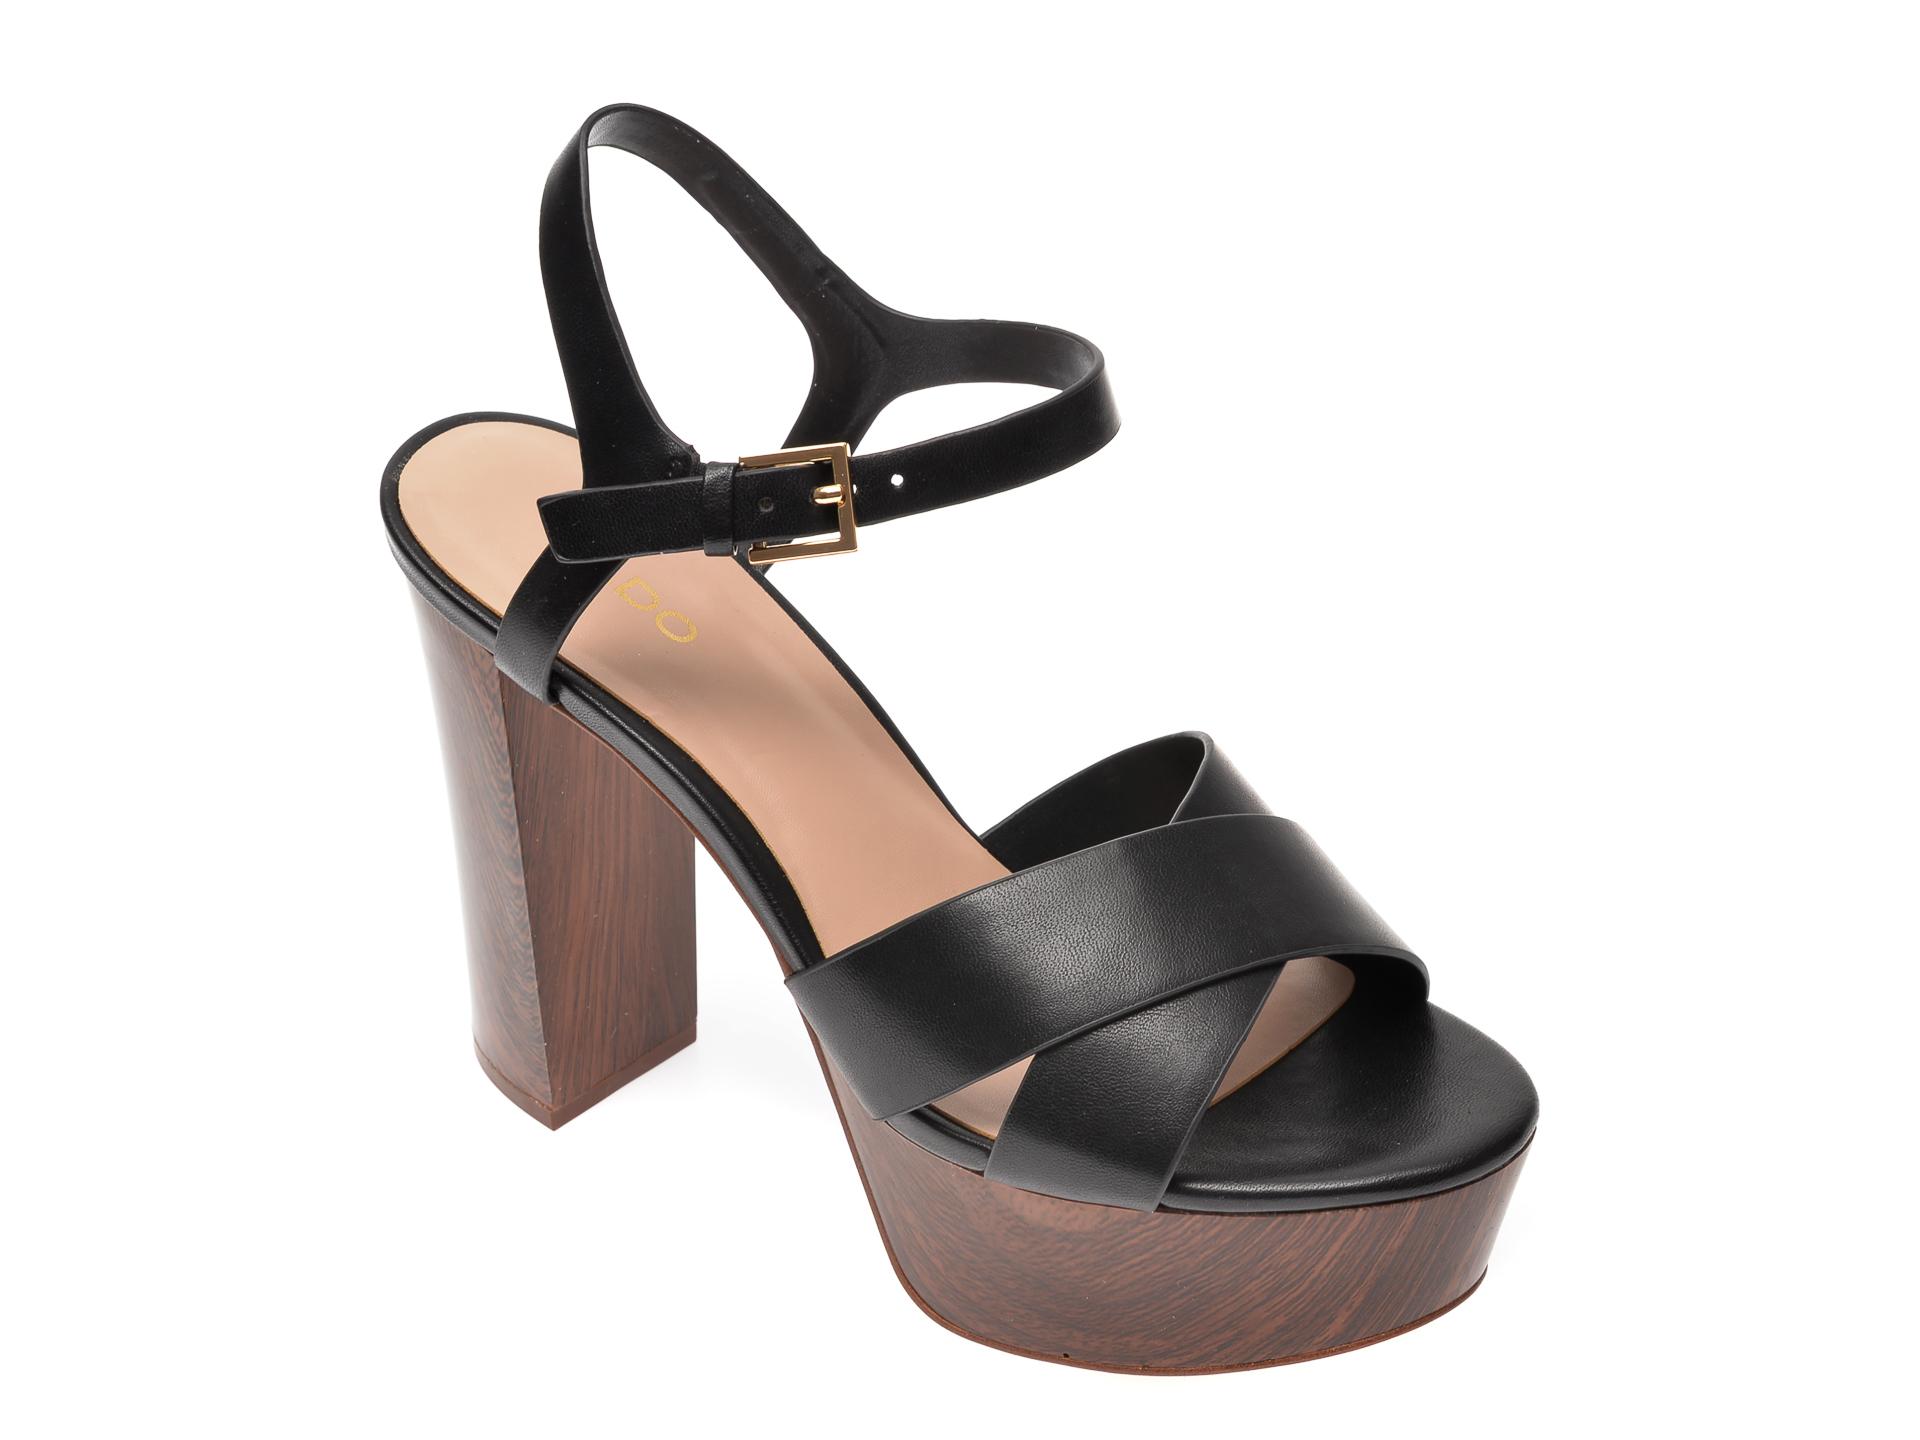 Sandale ALDO negre, Lewarne001, din piele ecologica